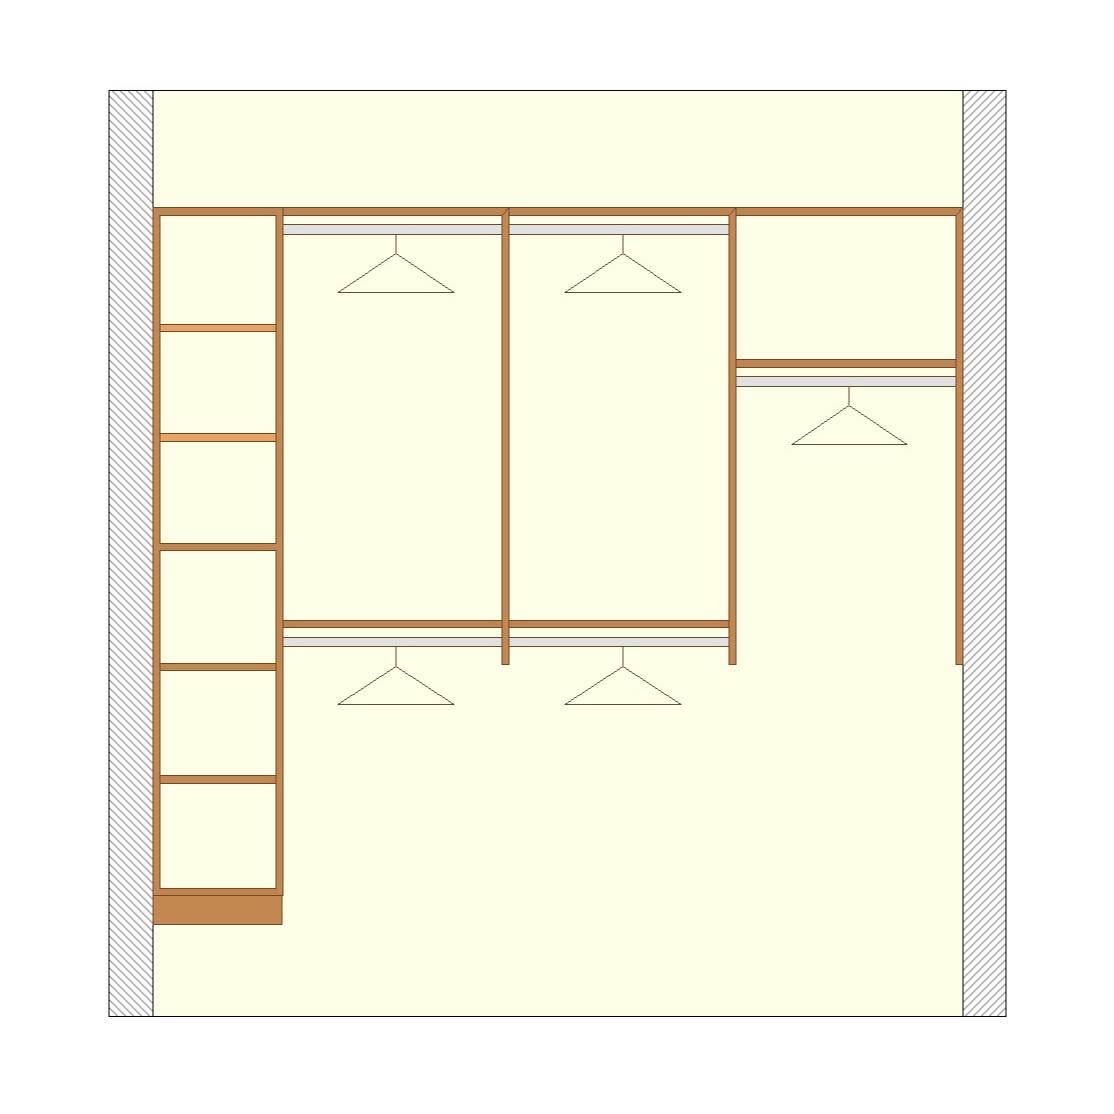 Shelving w/Short & Long Hanging Racks - Premium Walk-In Closet